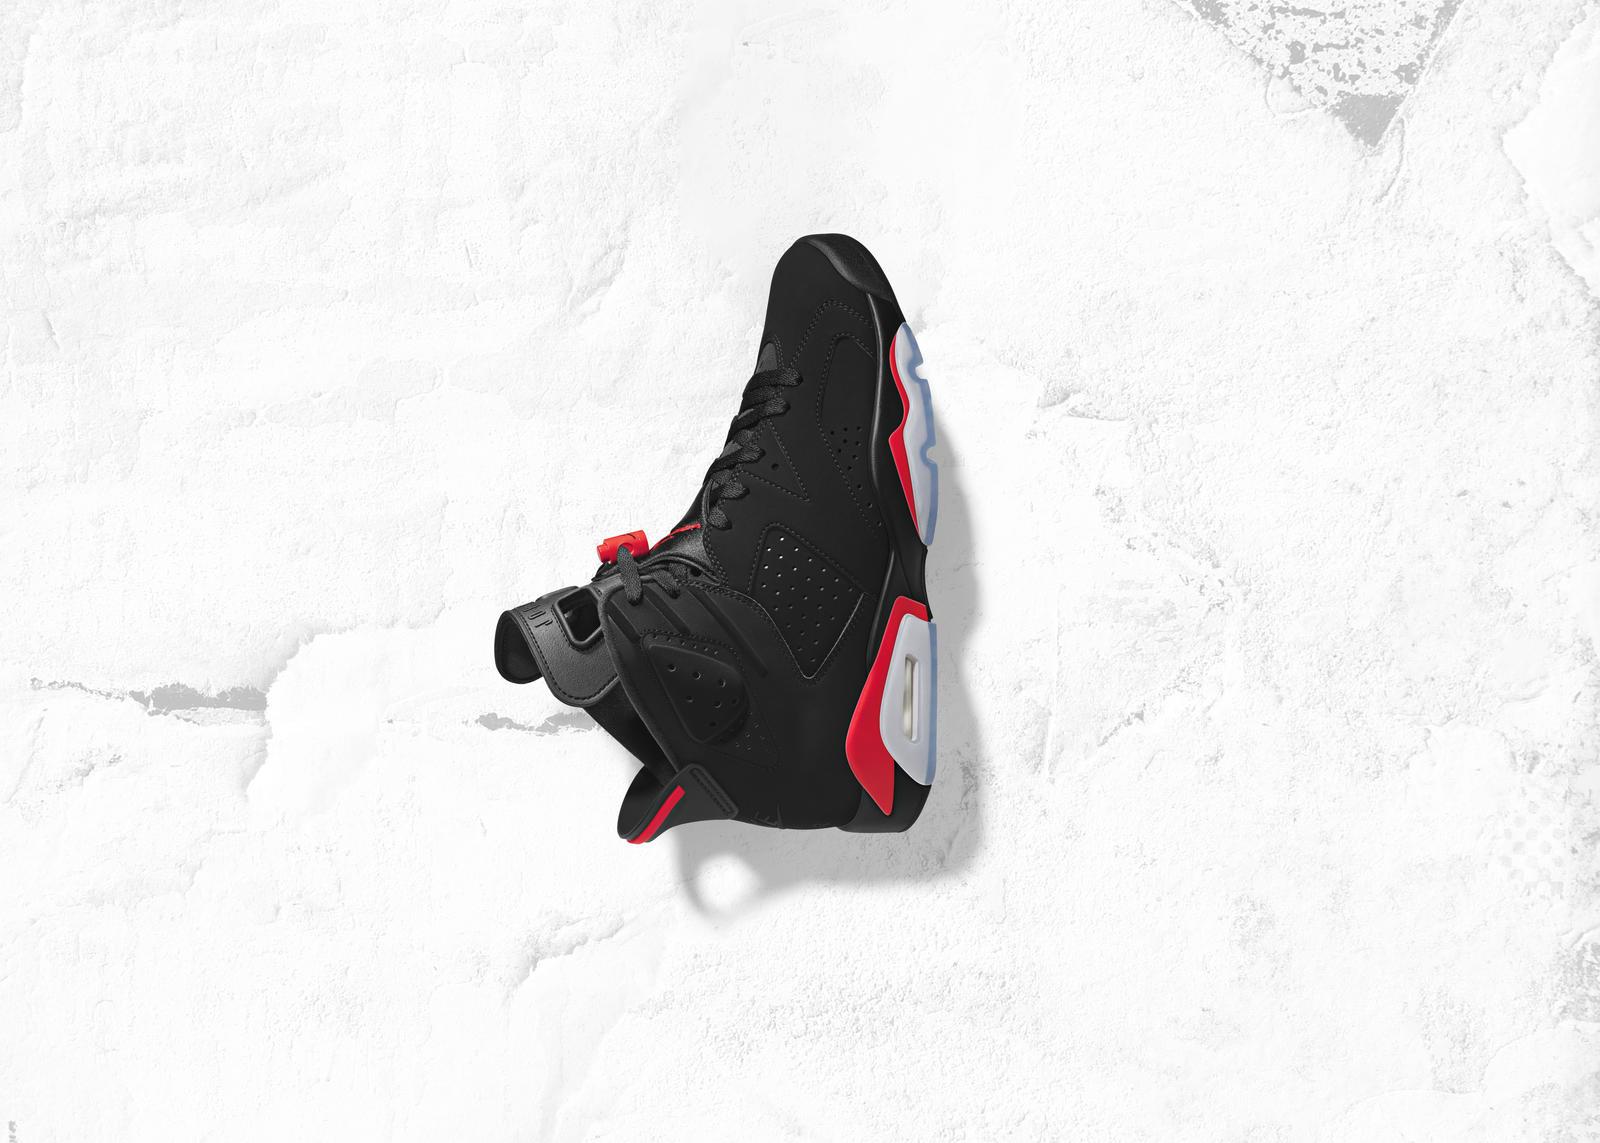 Nike and Jordan Brand's 2019 NBA All Star Footwear Drops